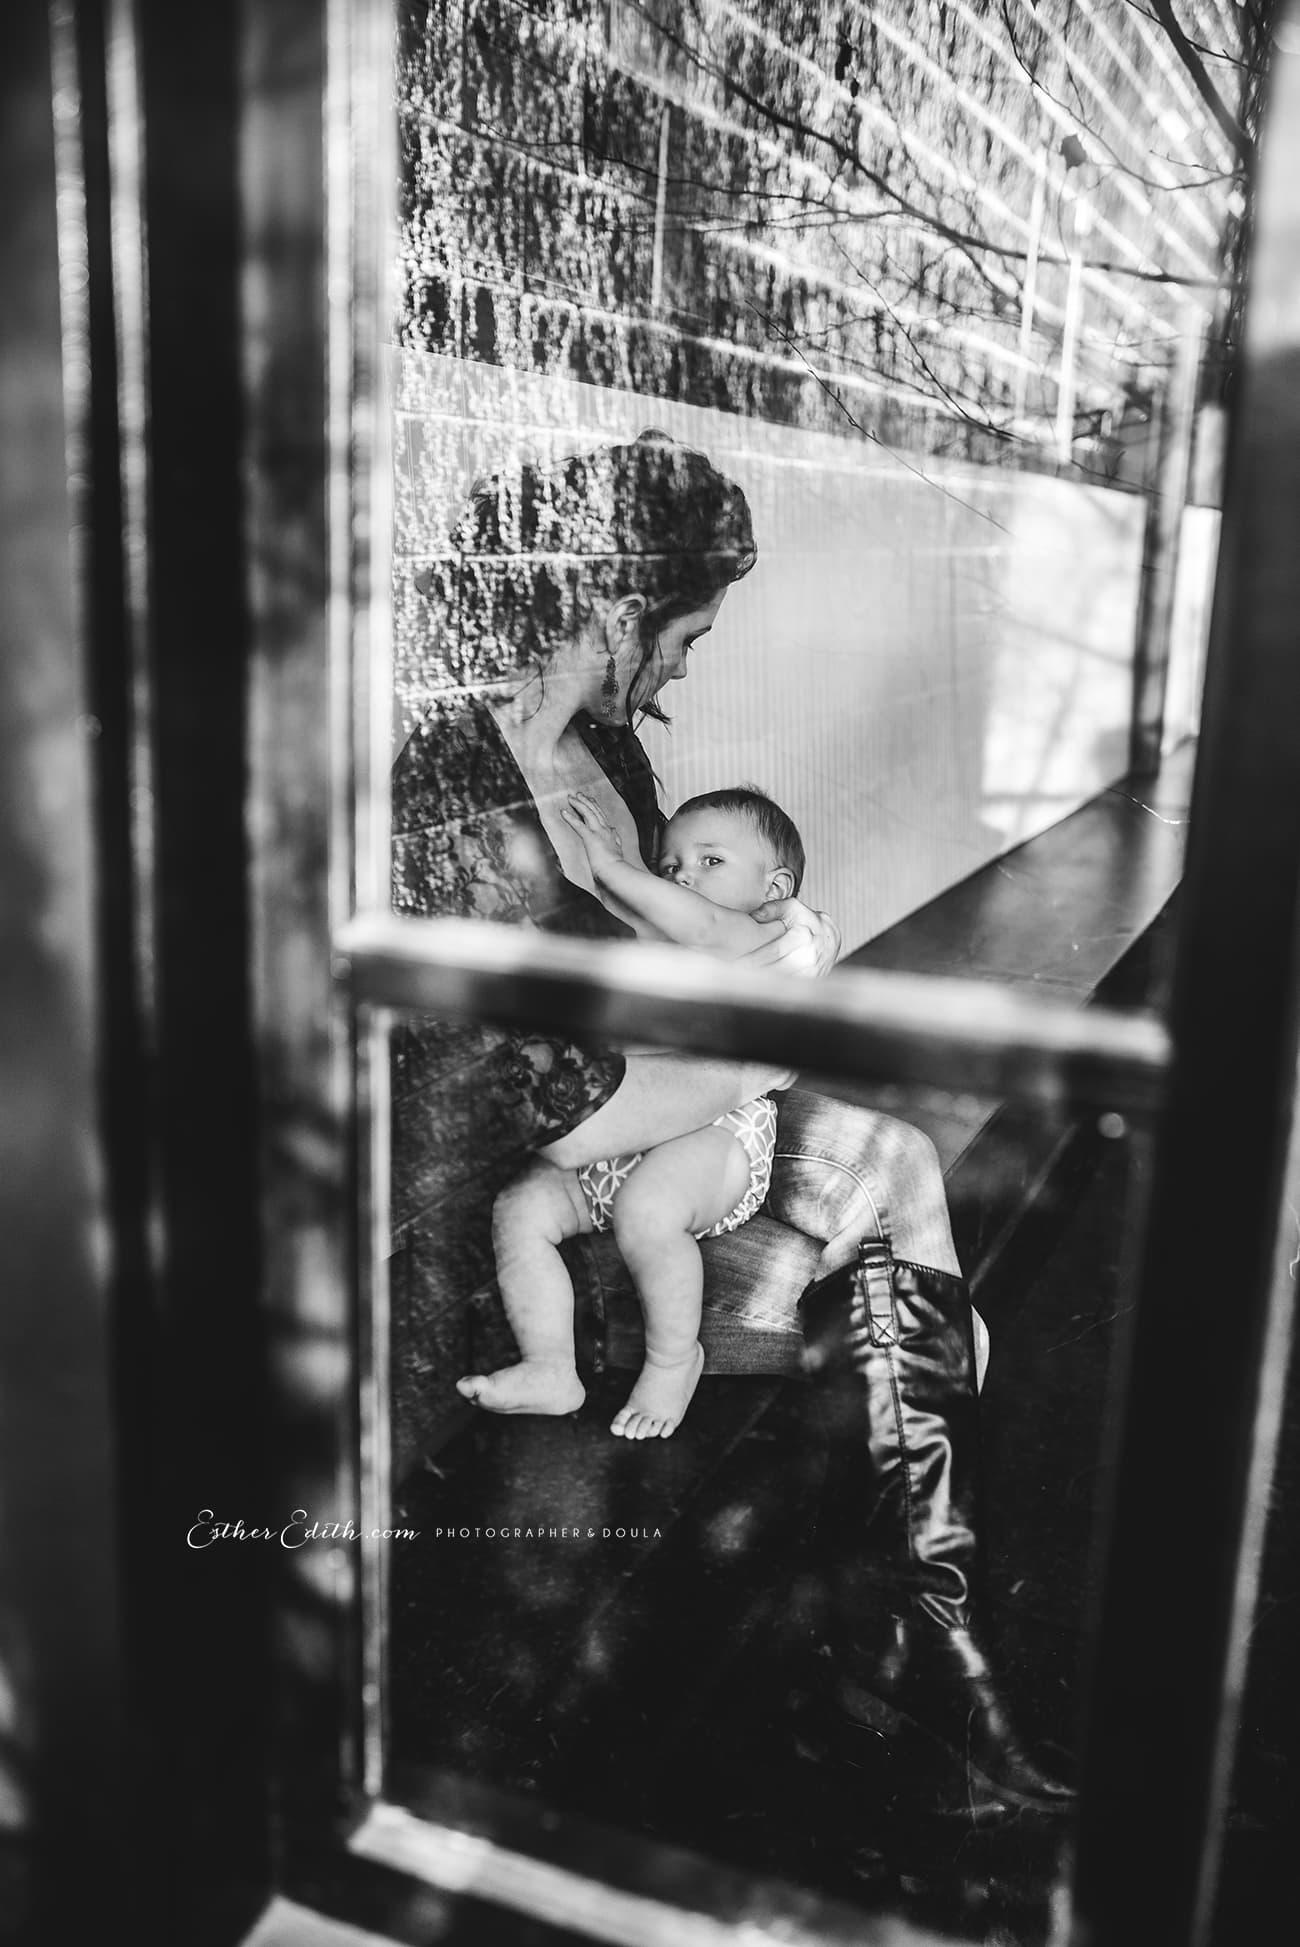 x-Esther-Edith-Spokane-Birth-Photographer-and-Doula-Breastfeeding-Motherhood-photography-siblings-indoors-nursing-public-photos-14